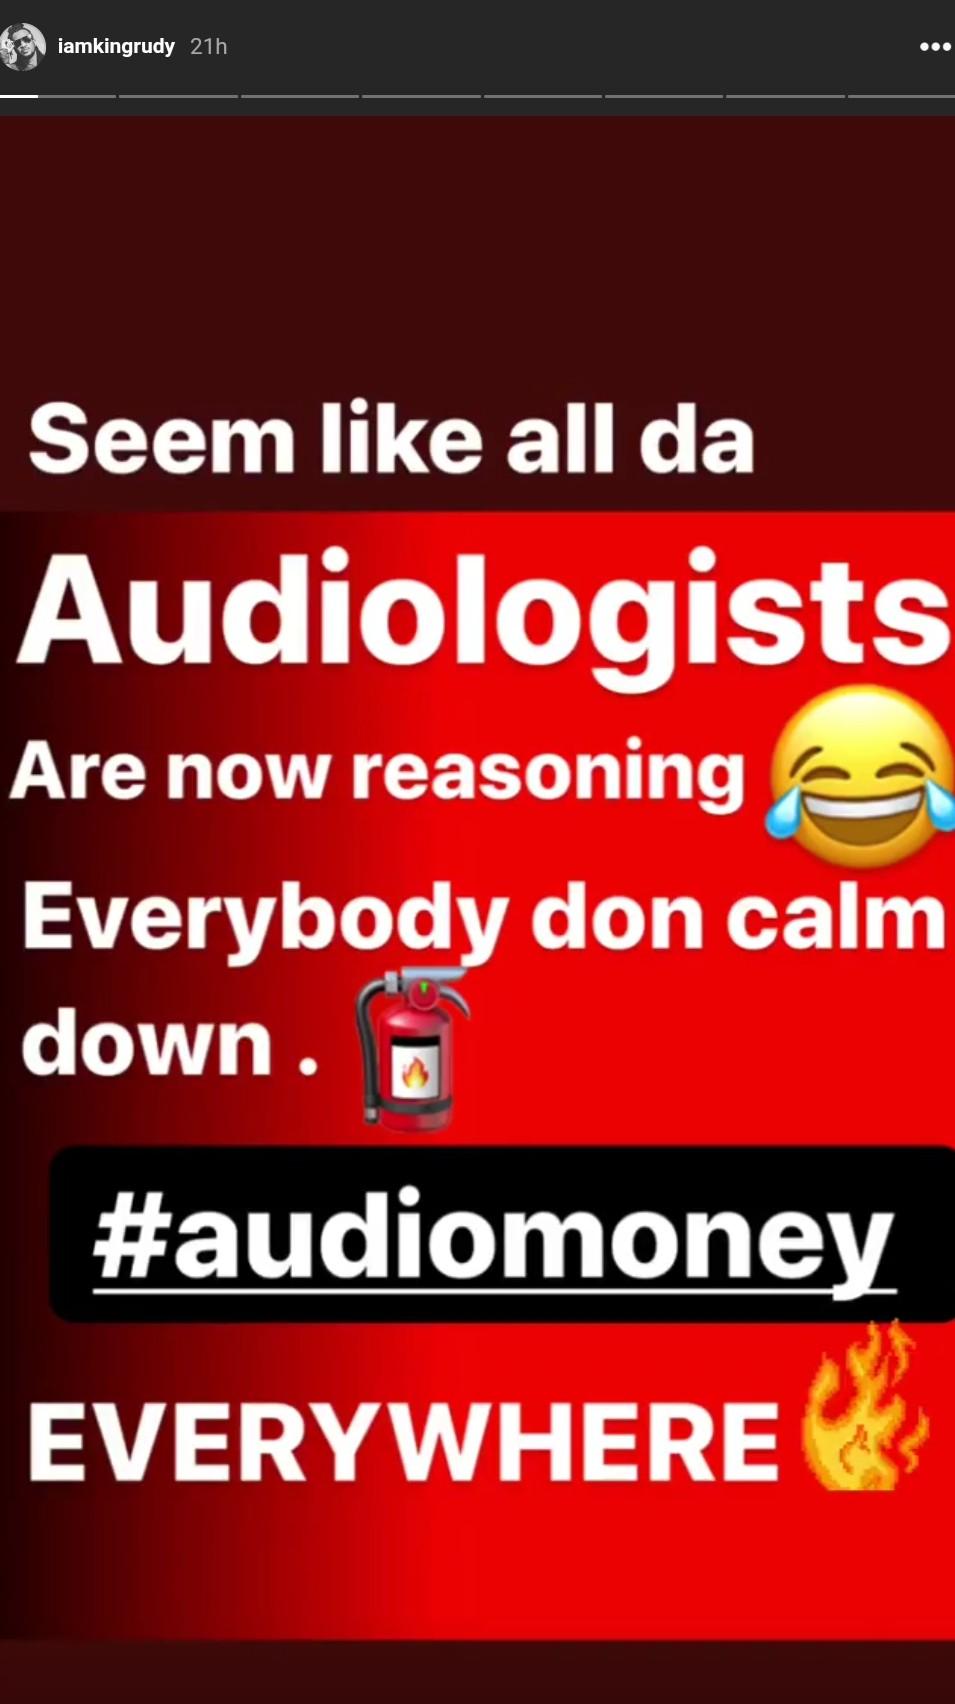 Paul Okoye Subtly Shades Brother Peter Over N60M Tacha Audio Money (2)